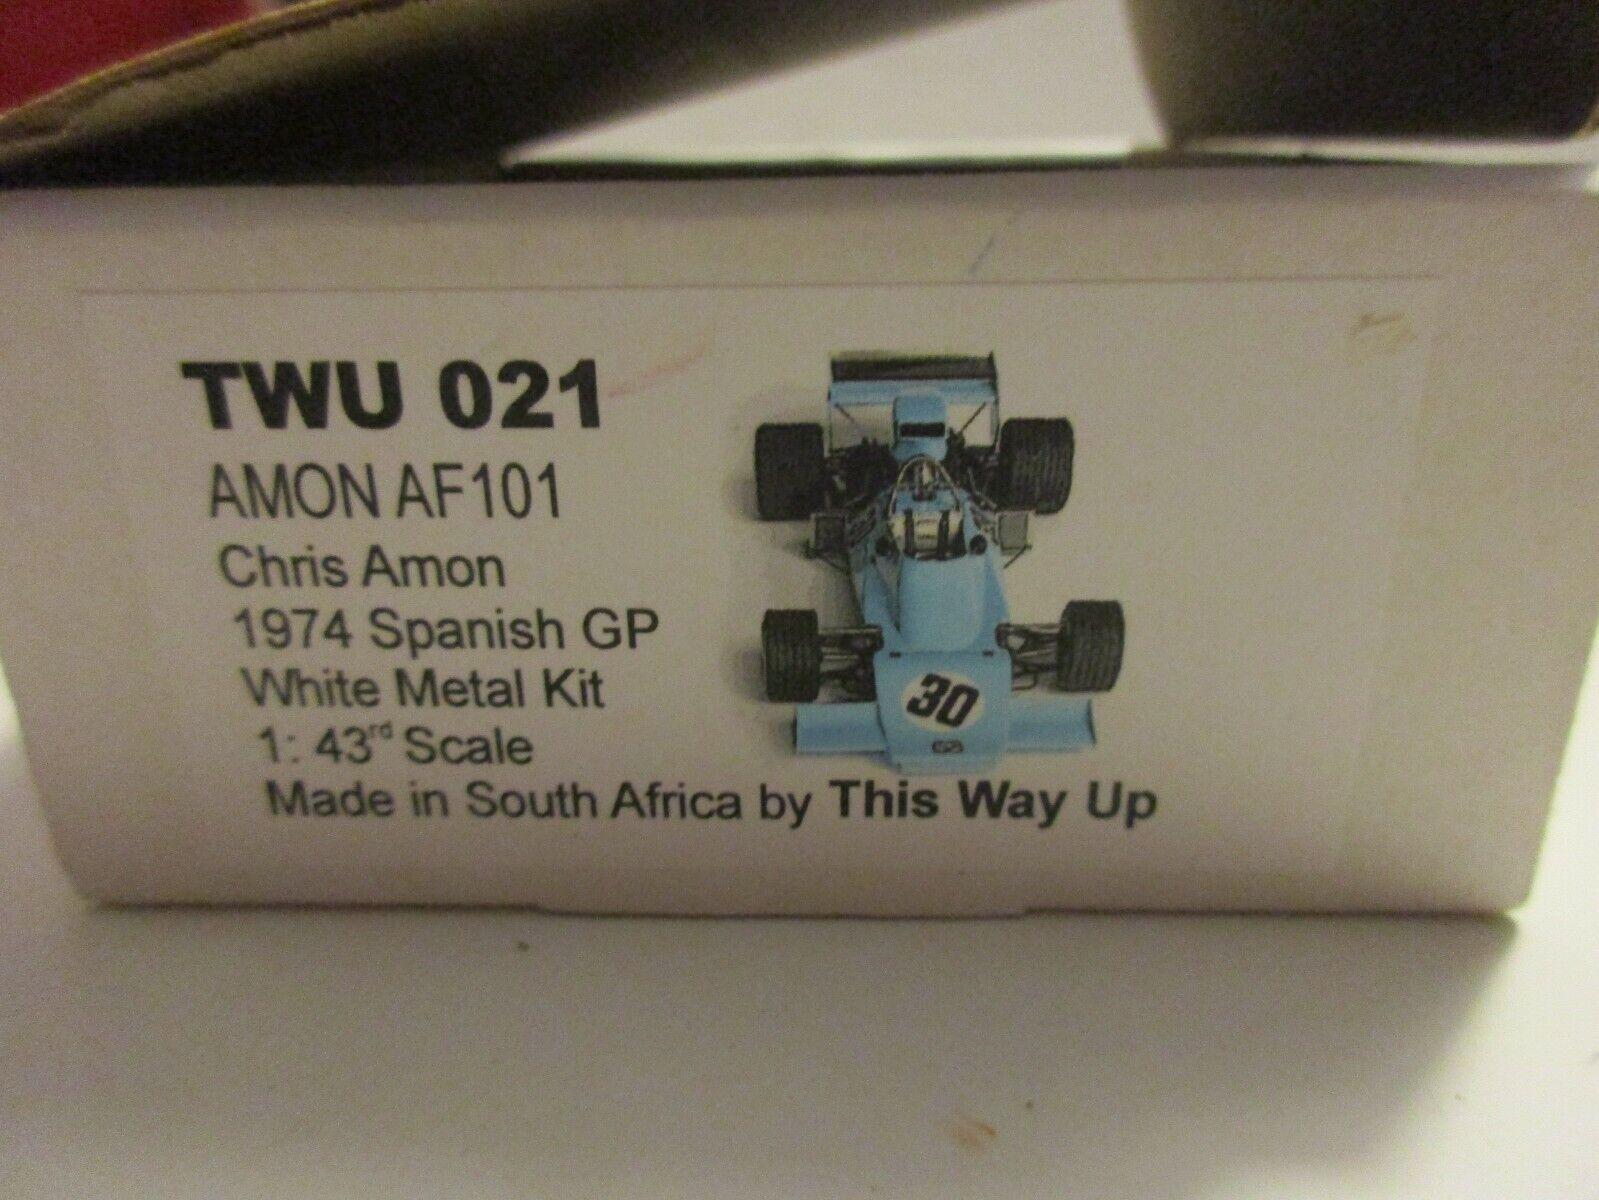 TWU THIS WAY UP 1 43 AMON AF 101 SPANISH GP 1974 CHRIS AMON  TWU021